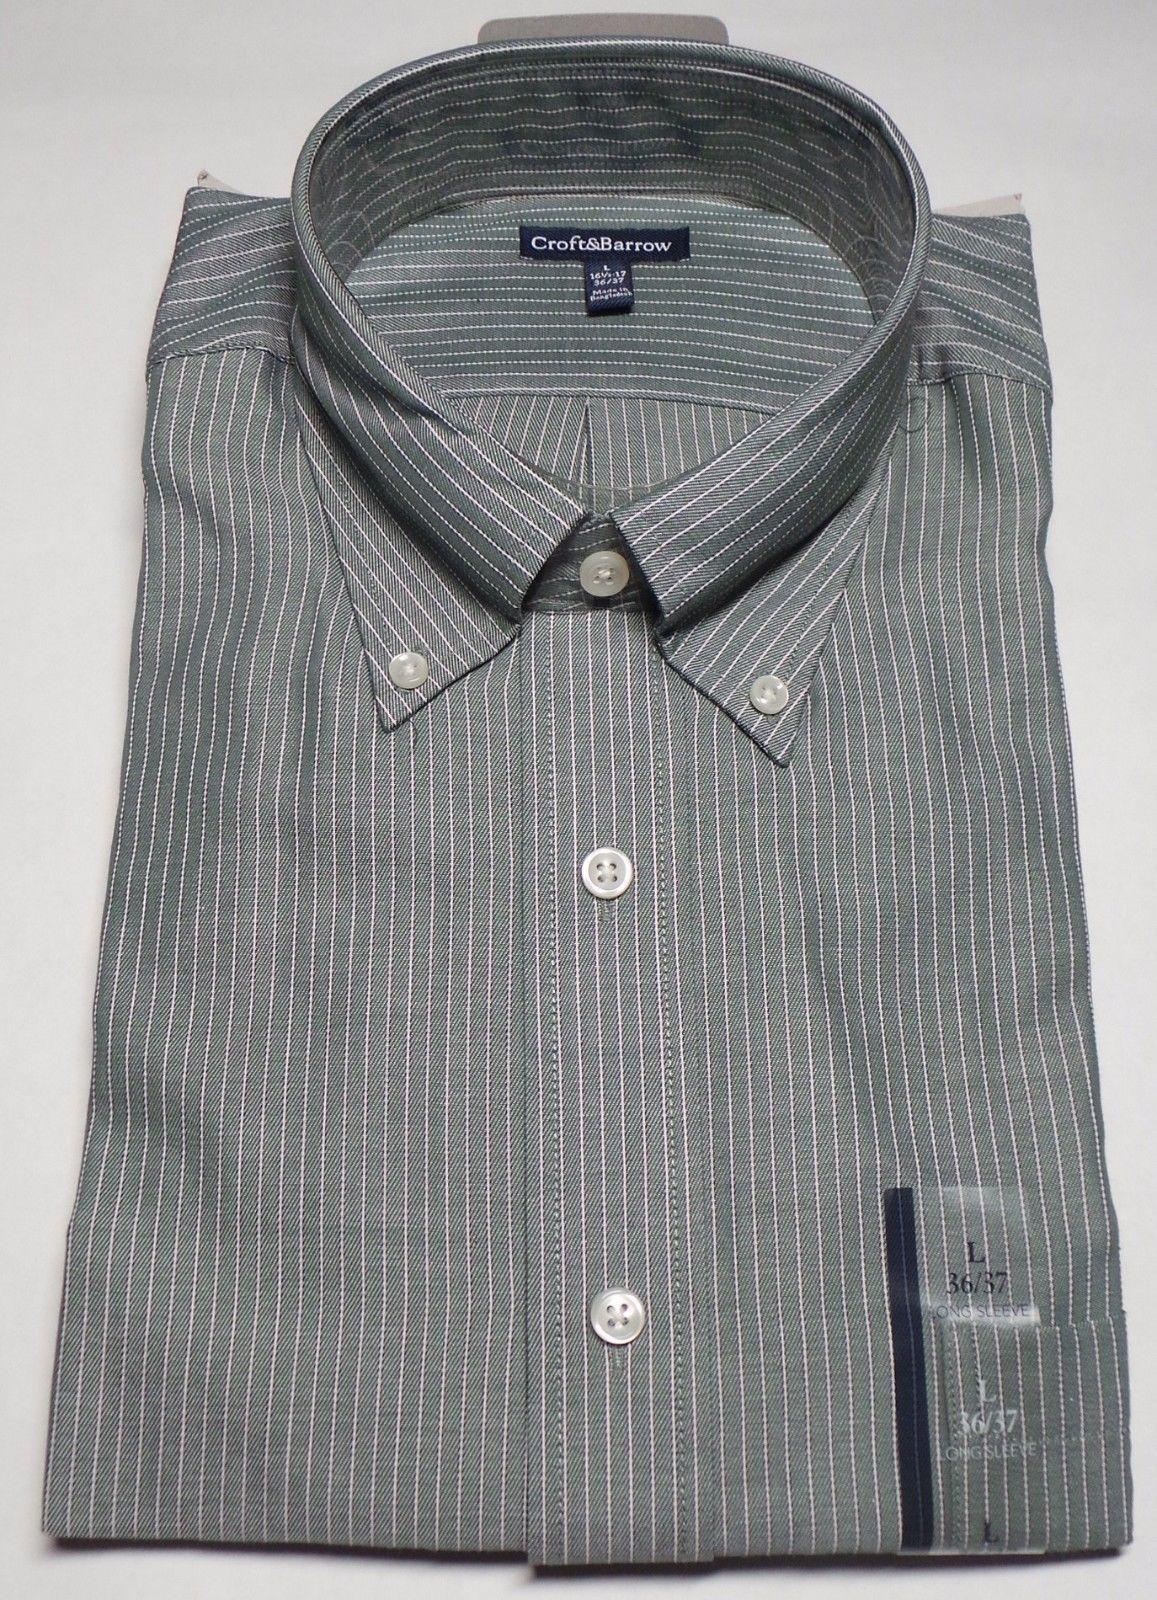 Croft & Barrow Full Sleeves Classic Fit  Mens Dress Shirt Size L 36/37